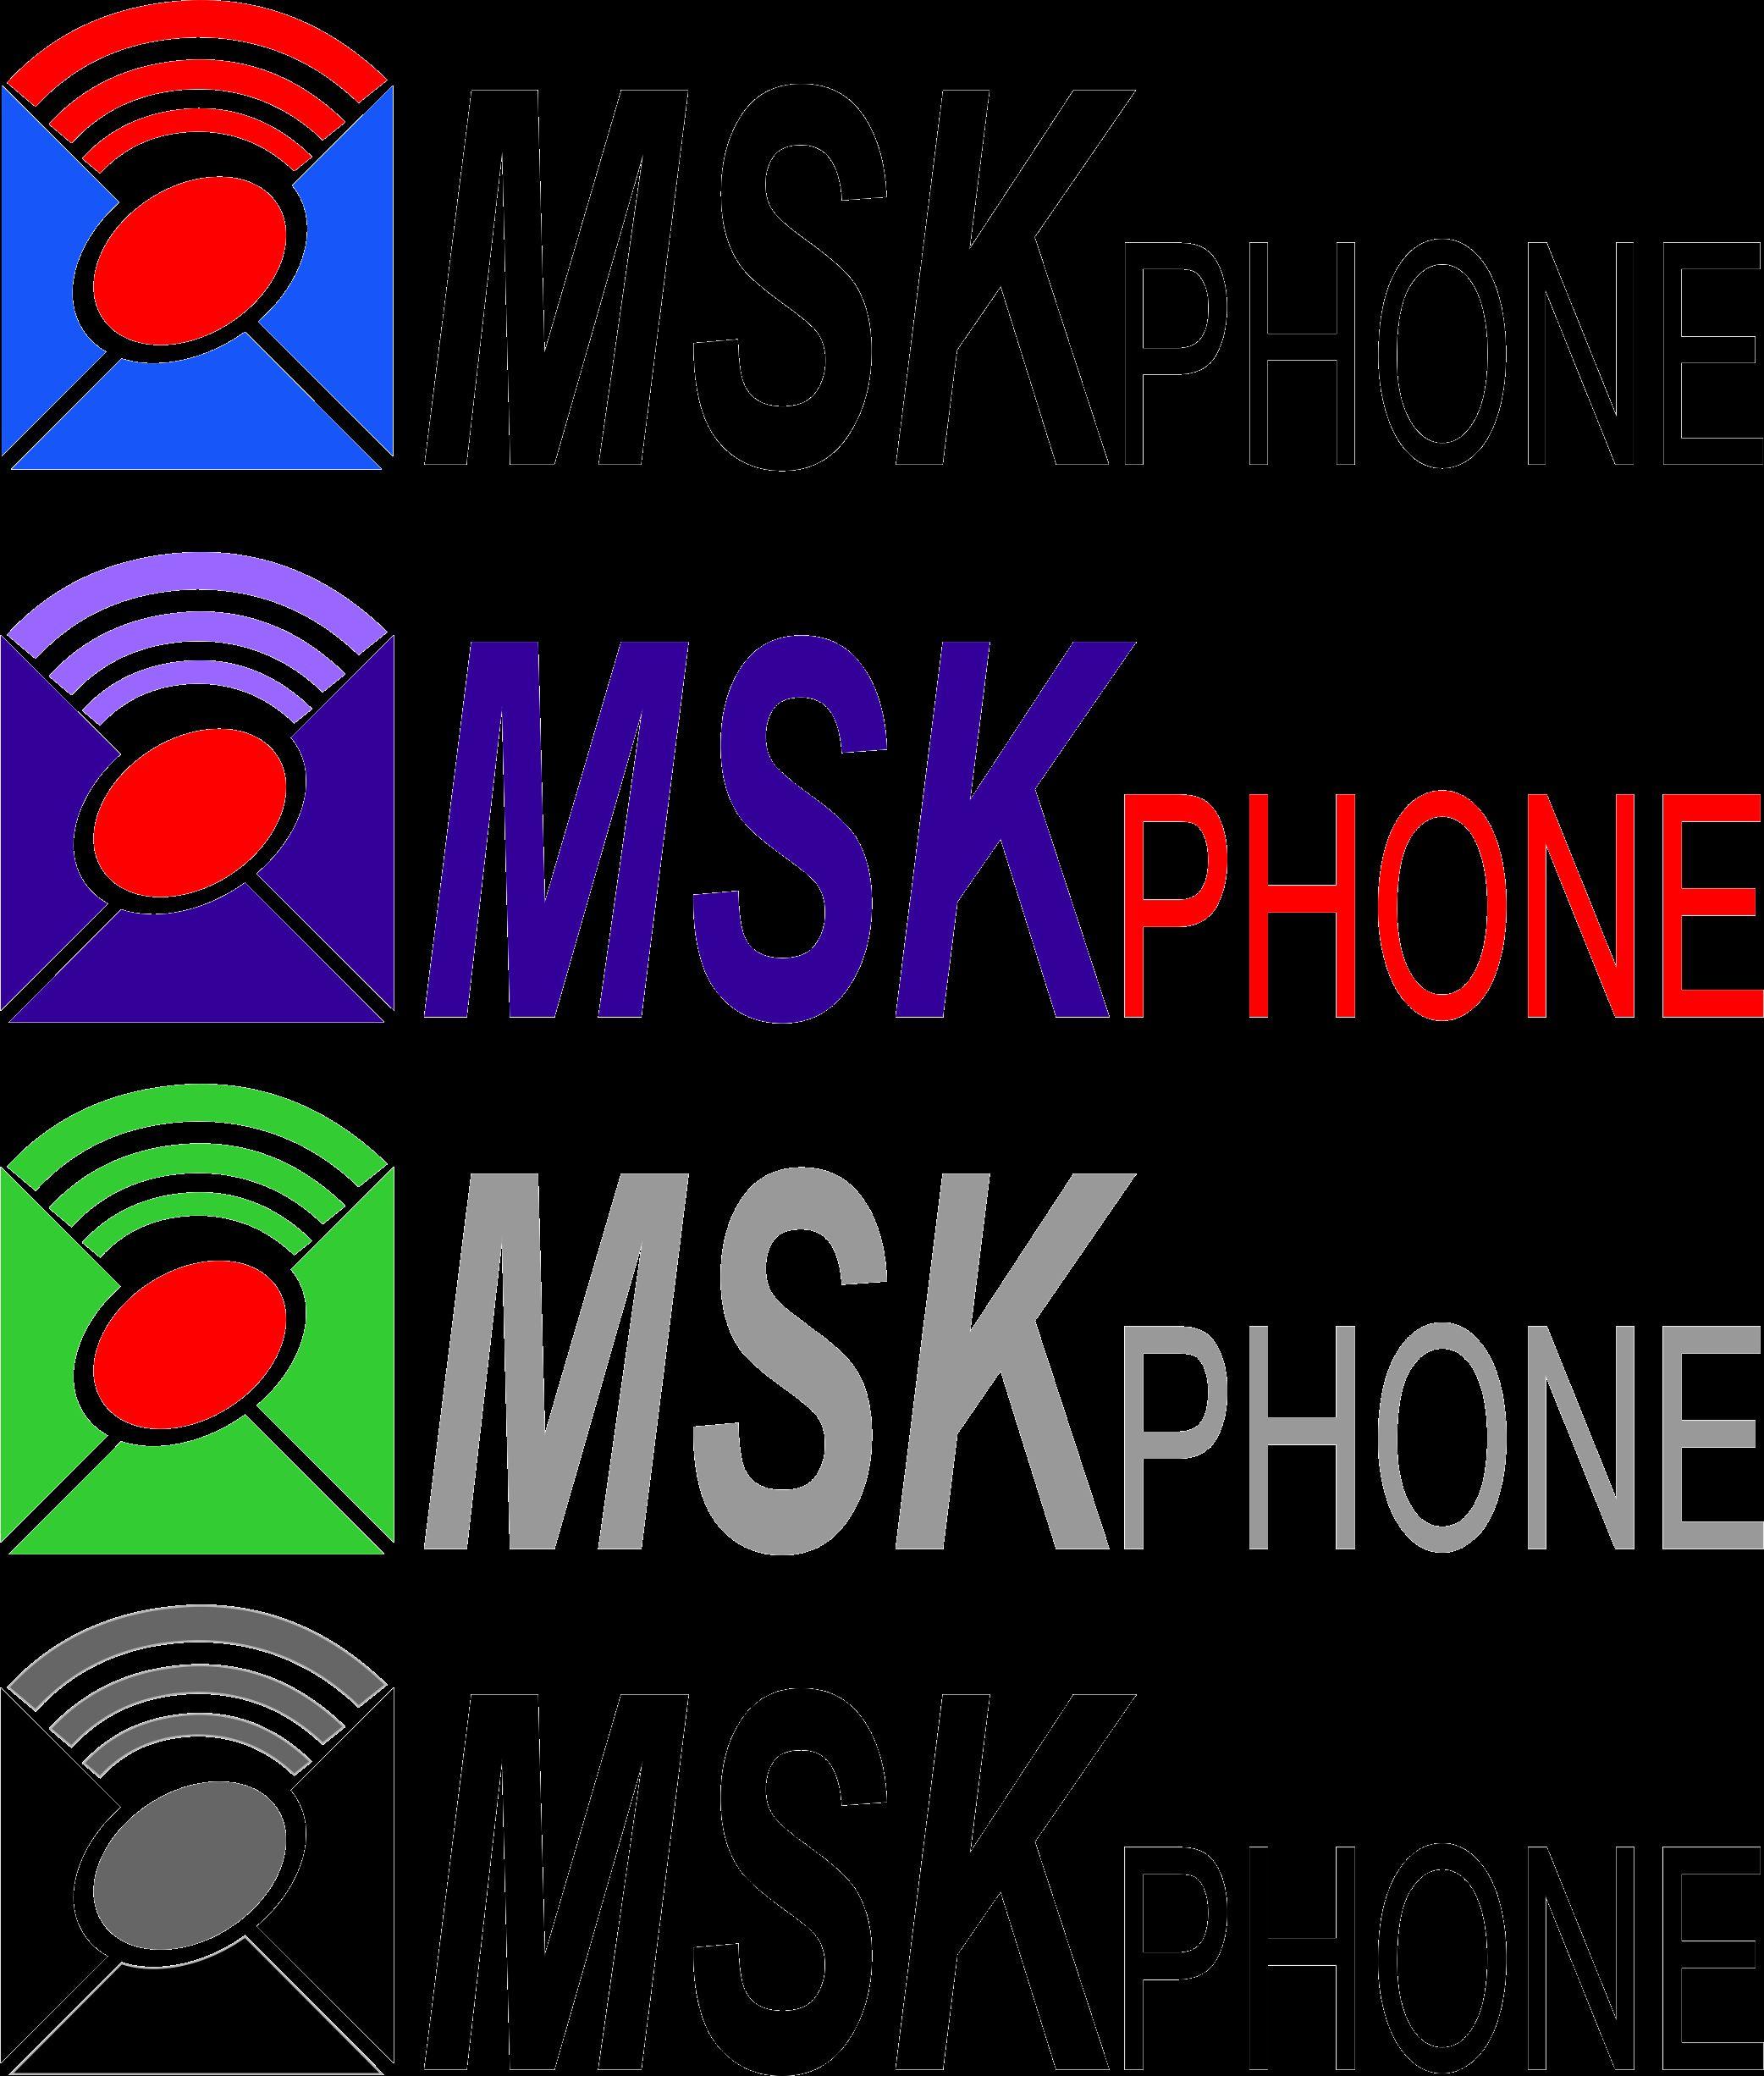 Логотип для MSKPHONE - дизайнер Ksushka1992